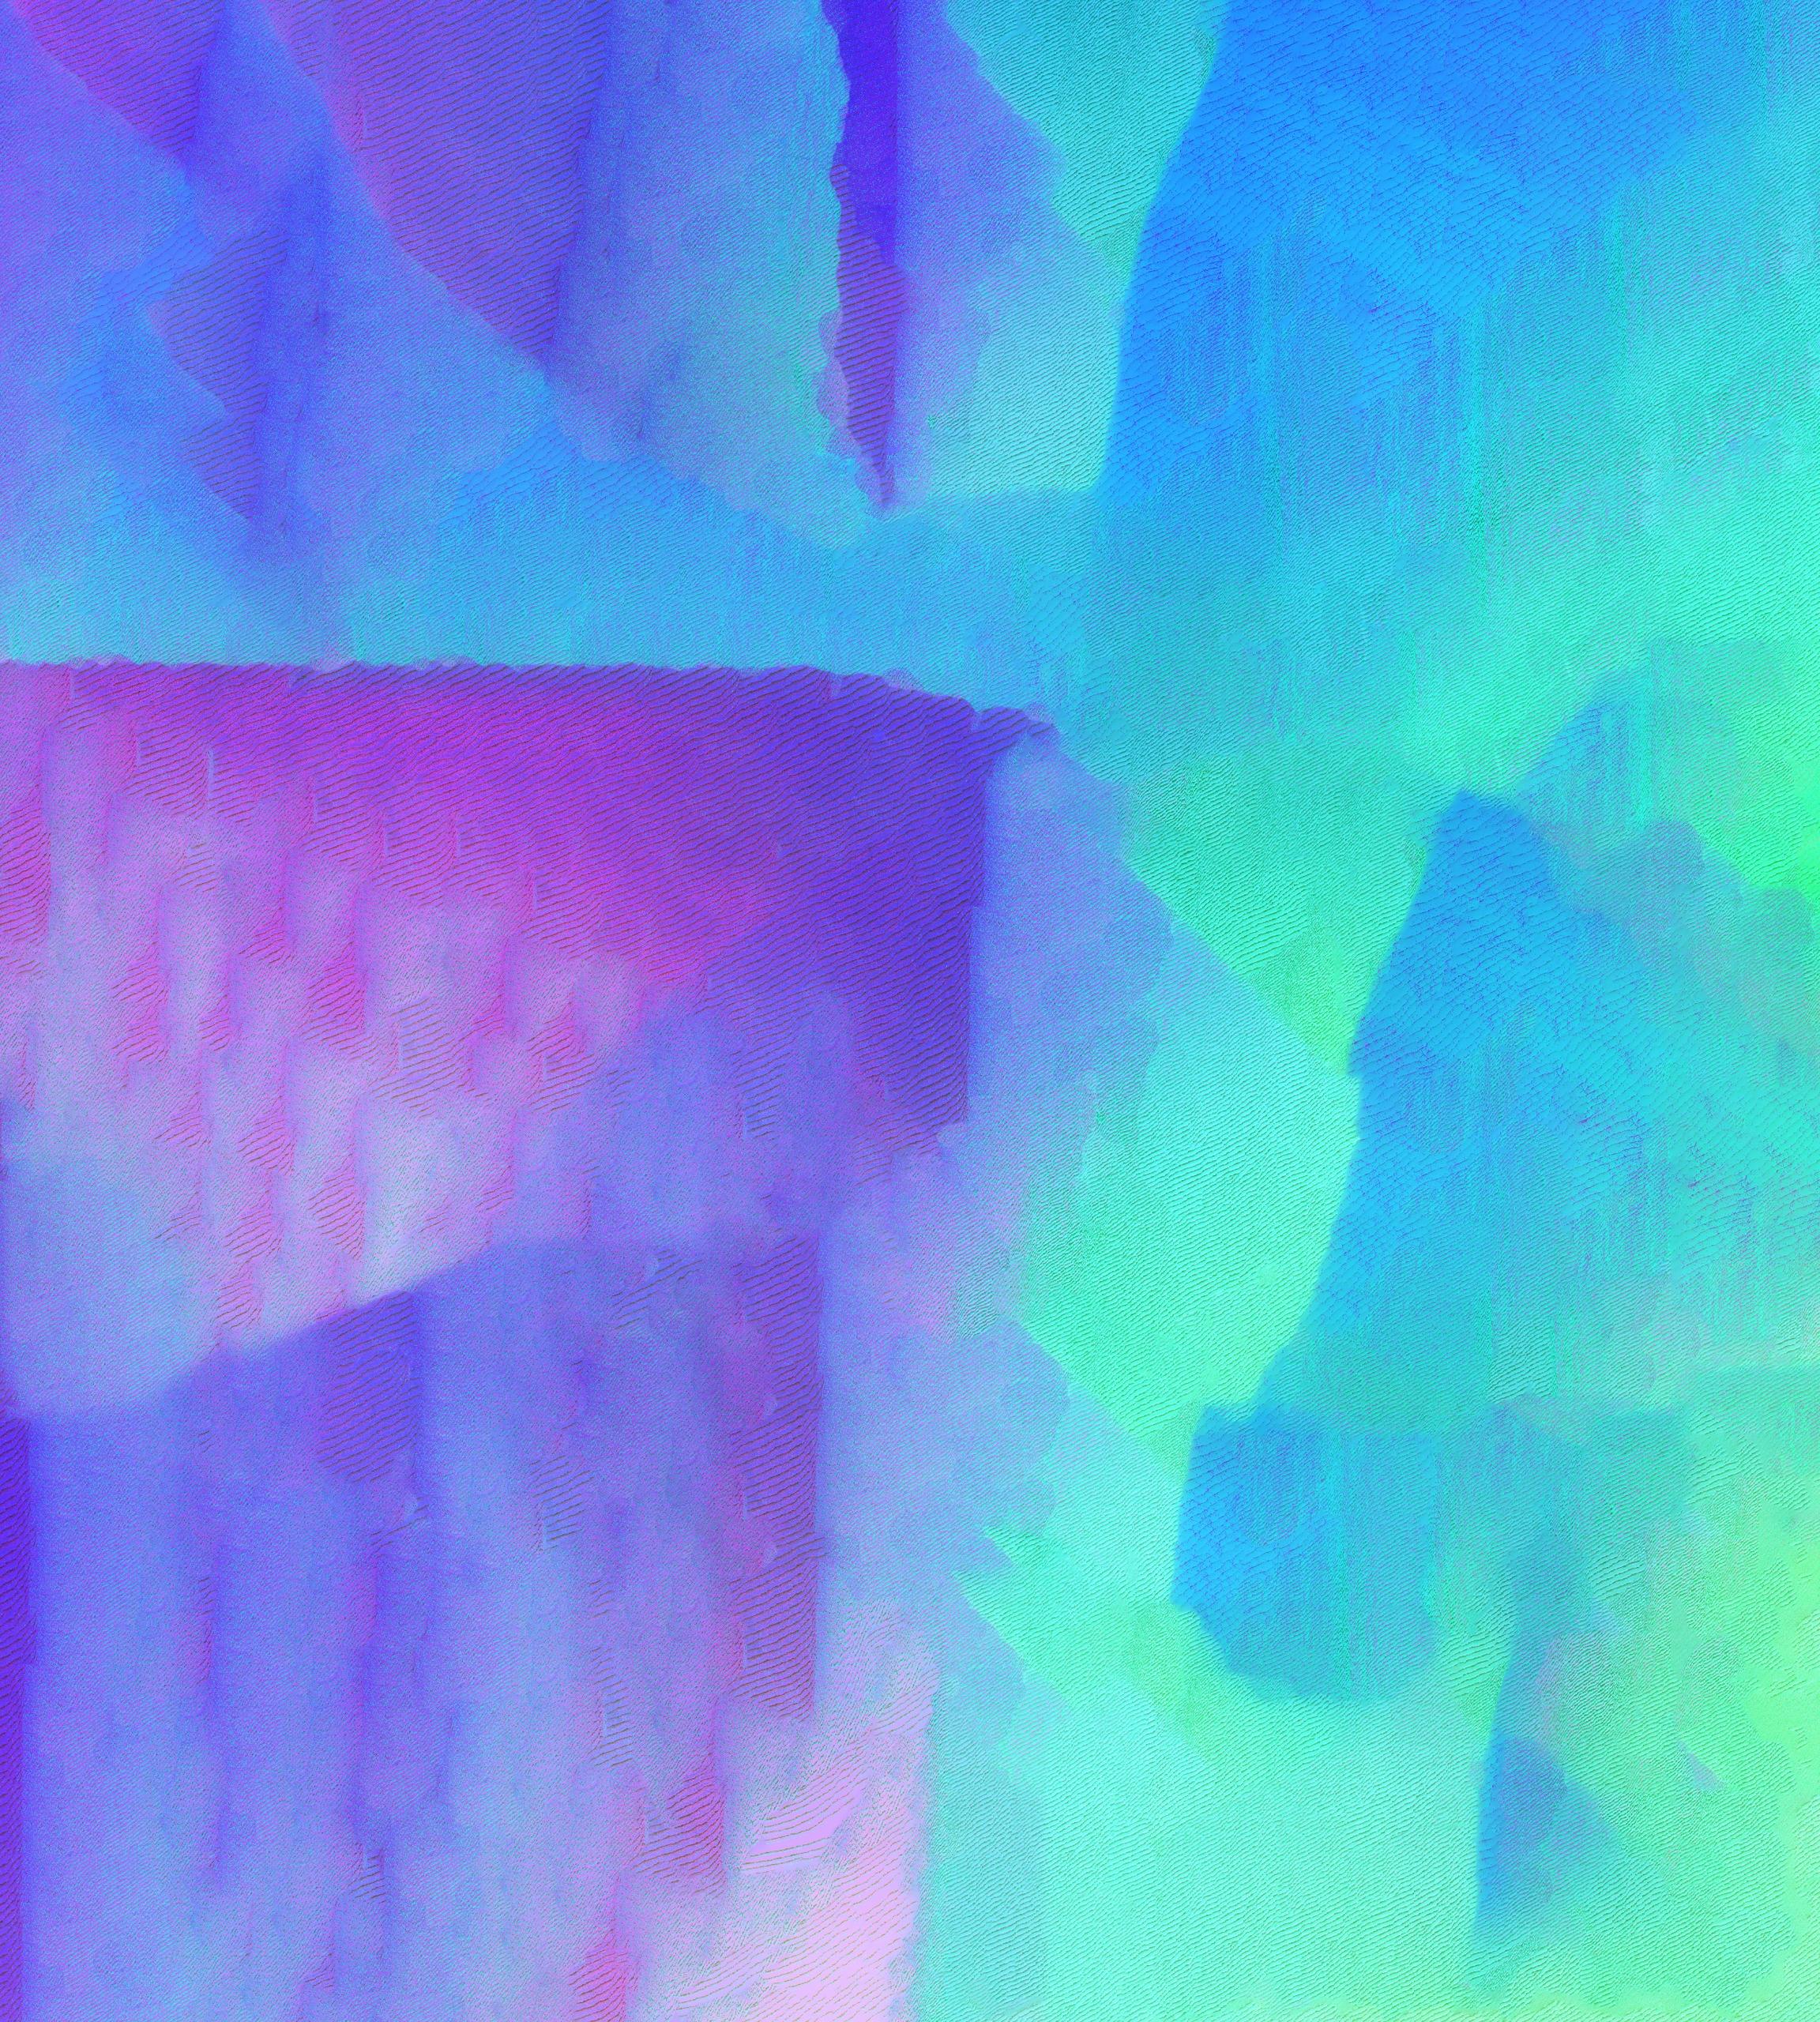 messscape - himalayev, digital, glitch - himalayev   ello